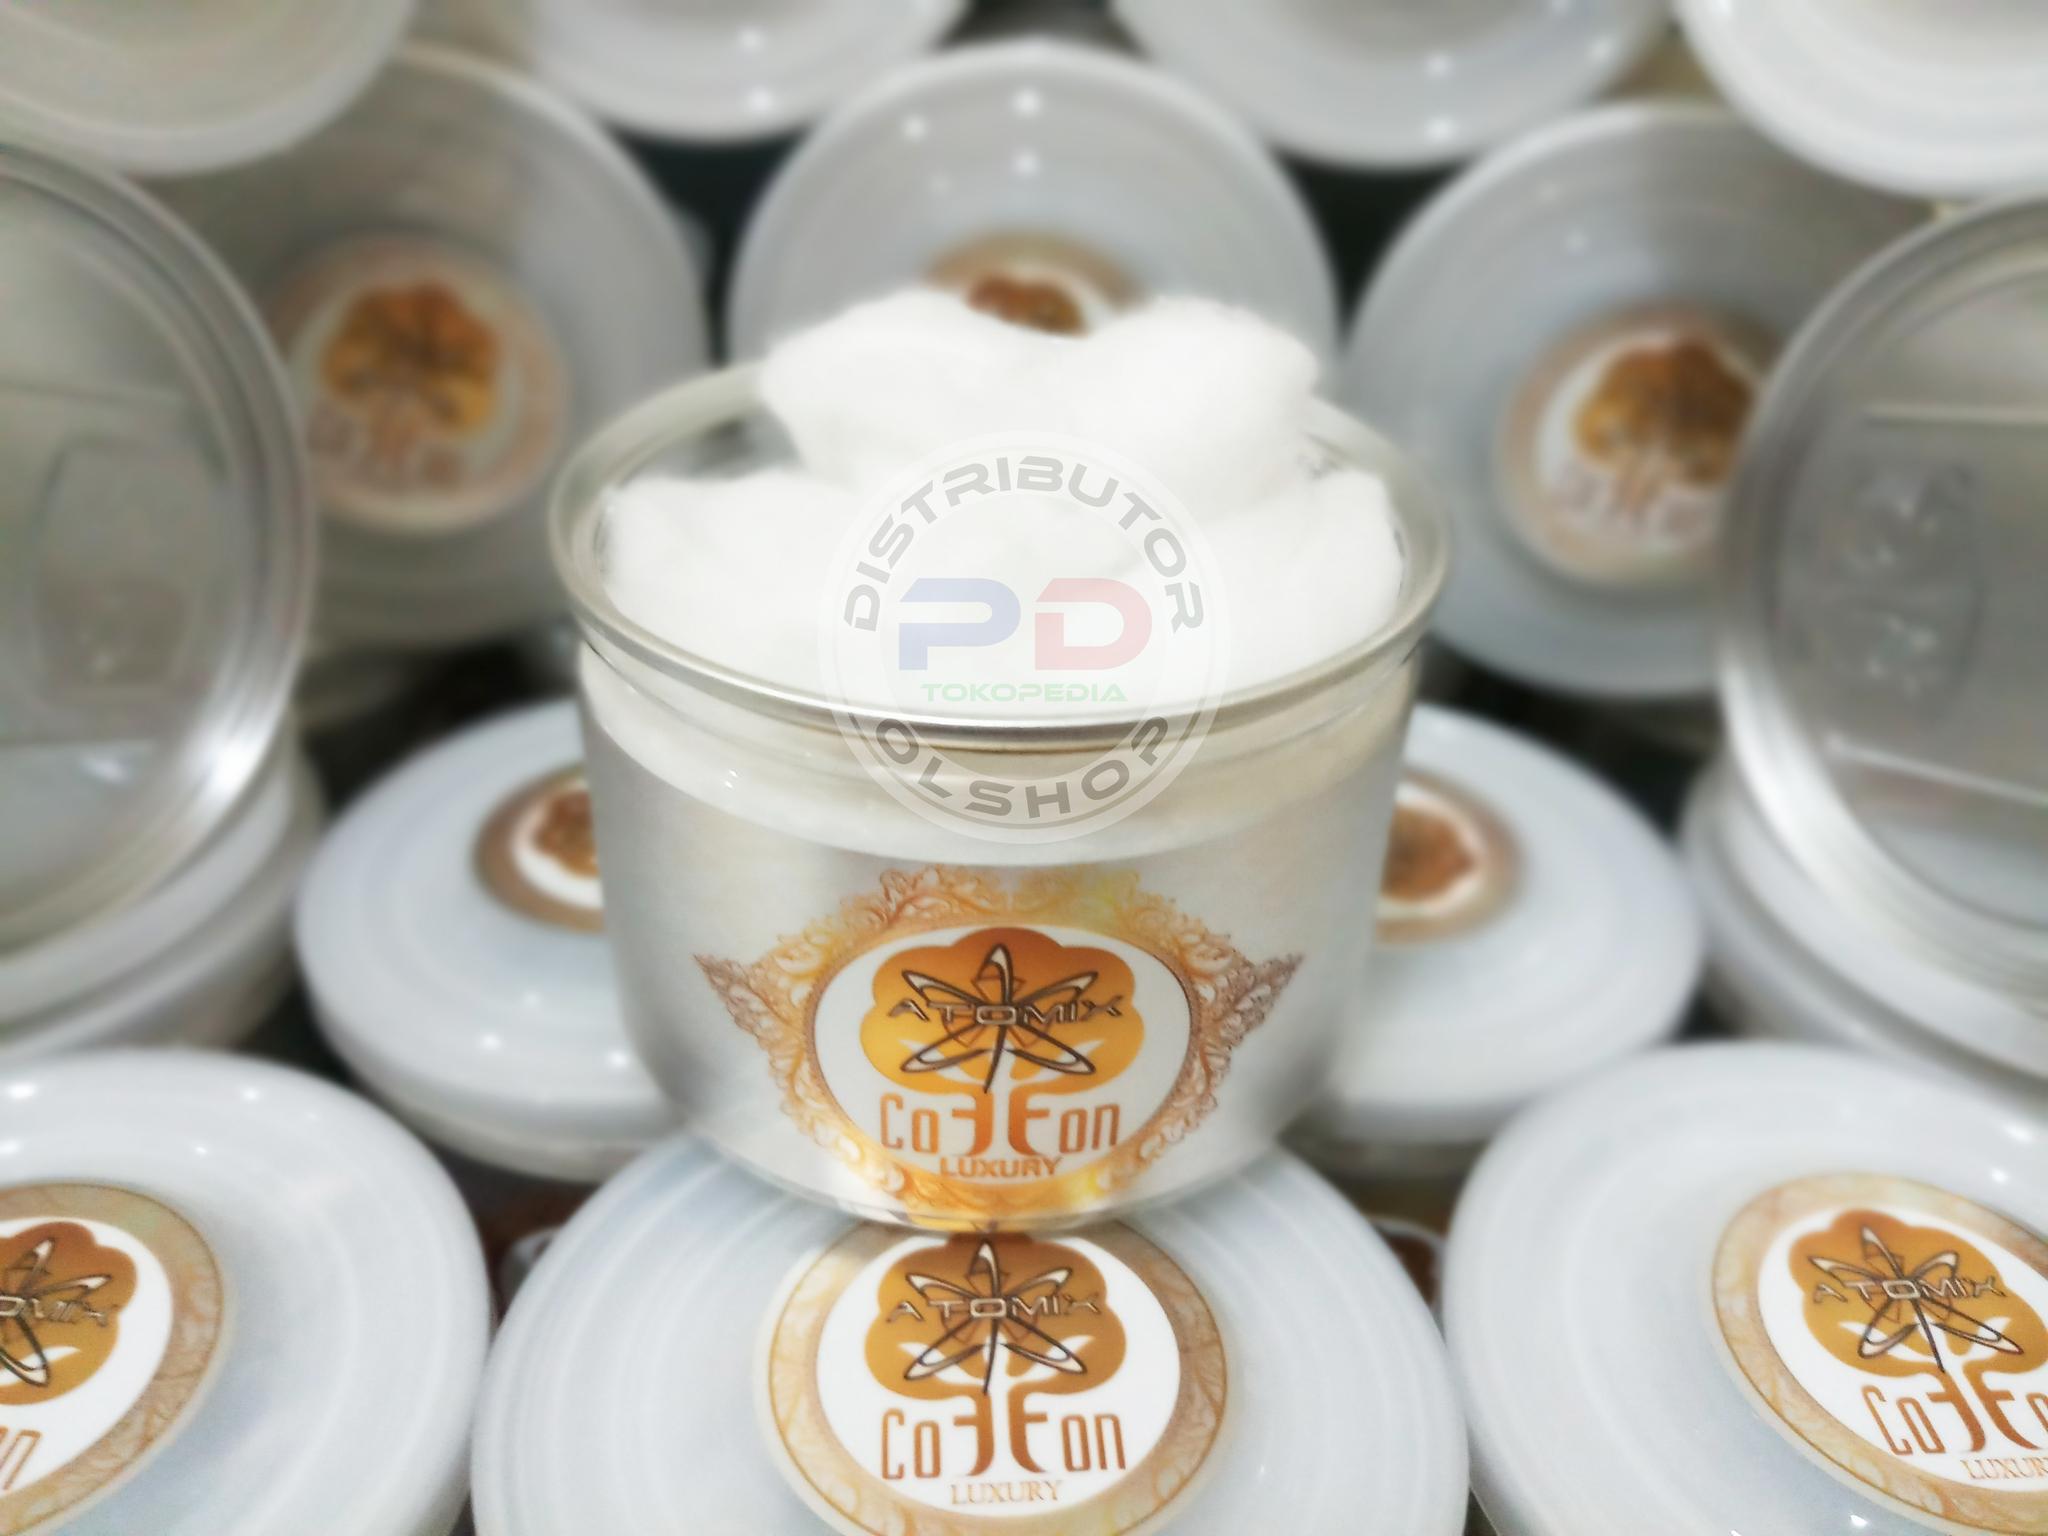 Jual Kapas Atomix Cotton Luxury Authentic Rda Rta Vape Liquid Not Flava Or Bacon Distributor Olshop Tokopedia